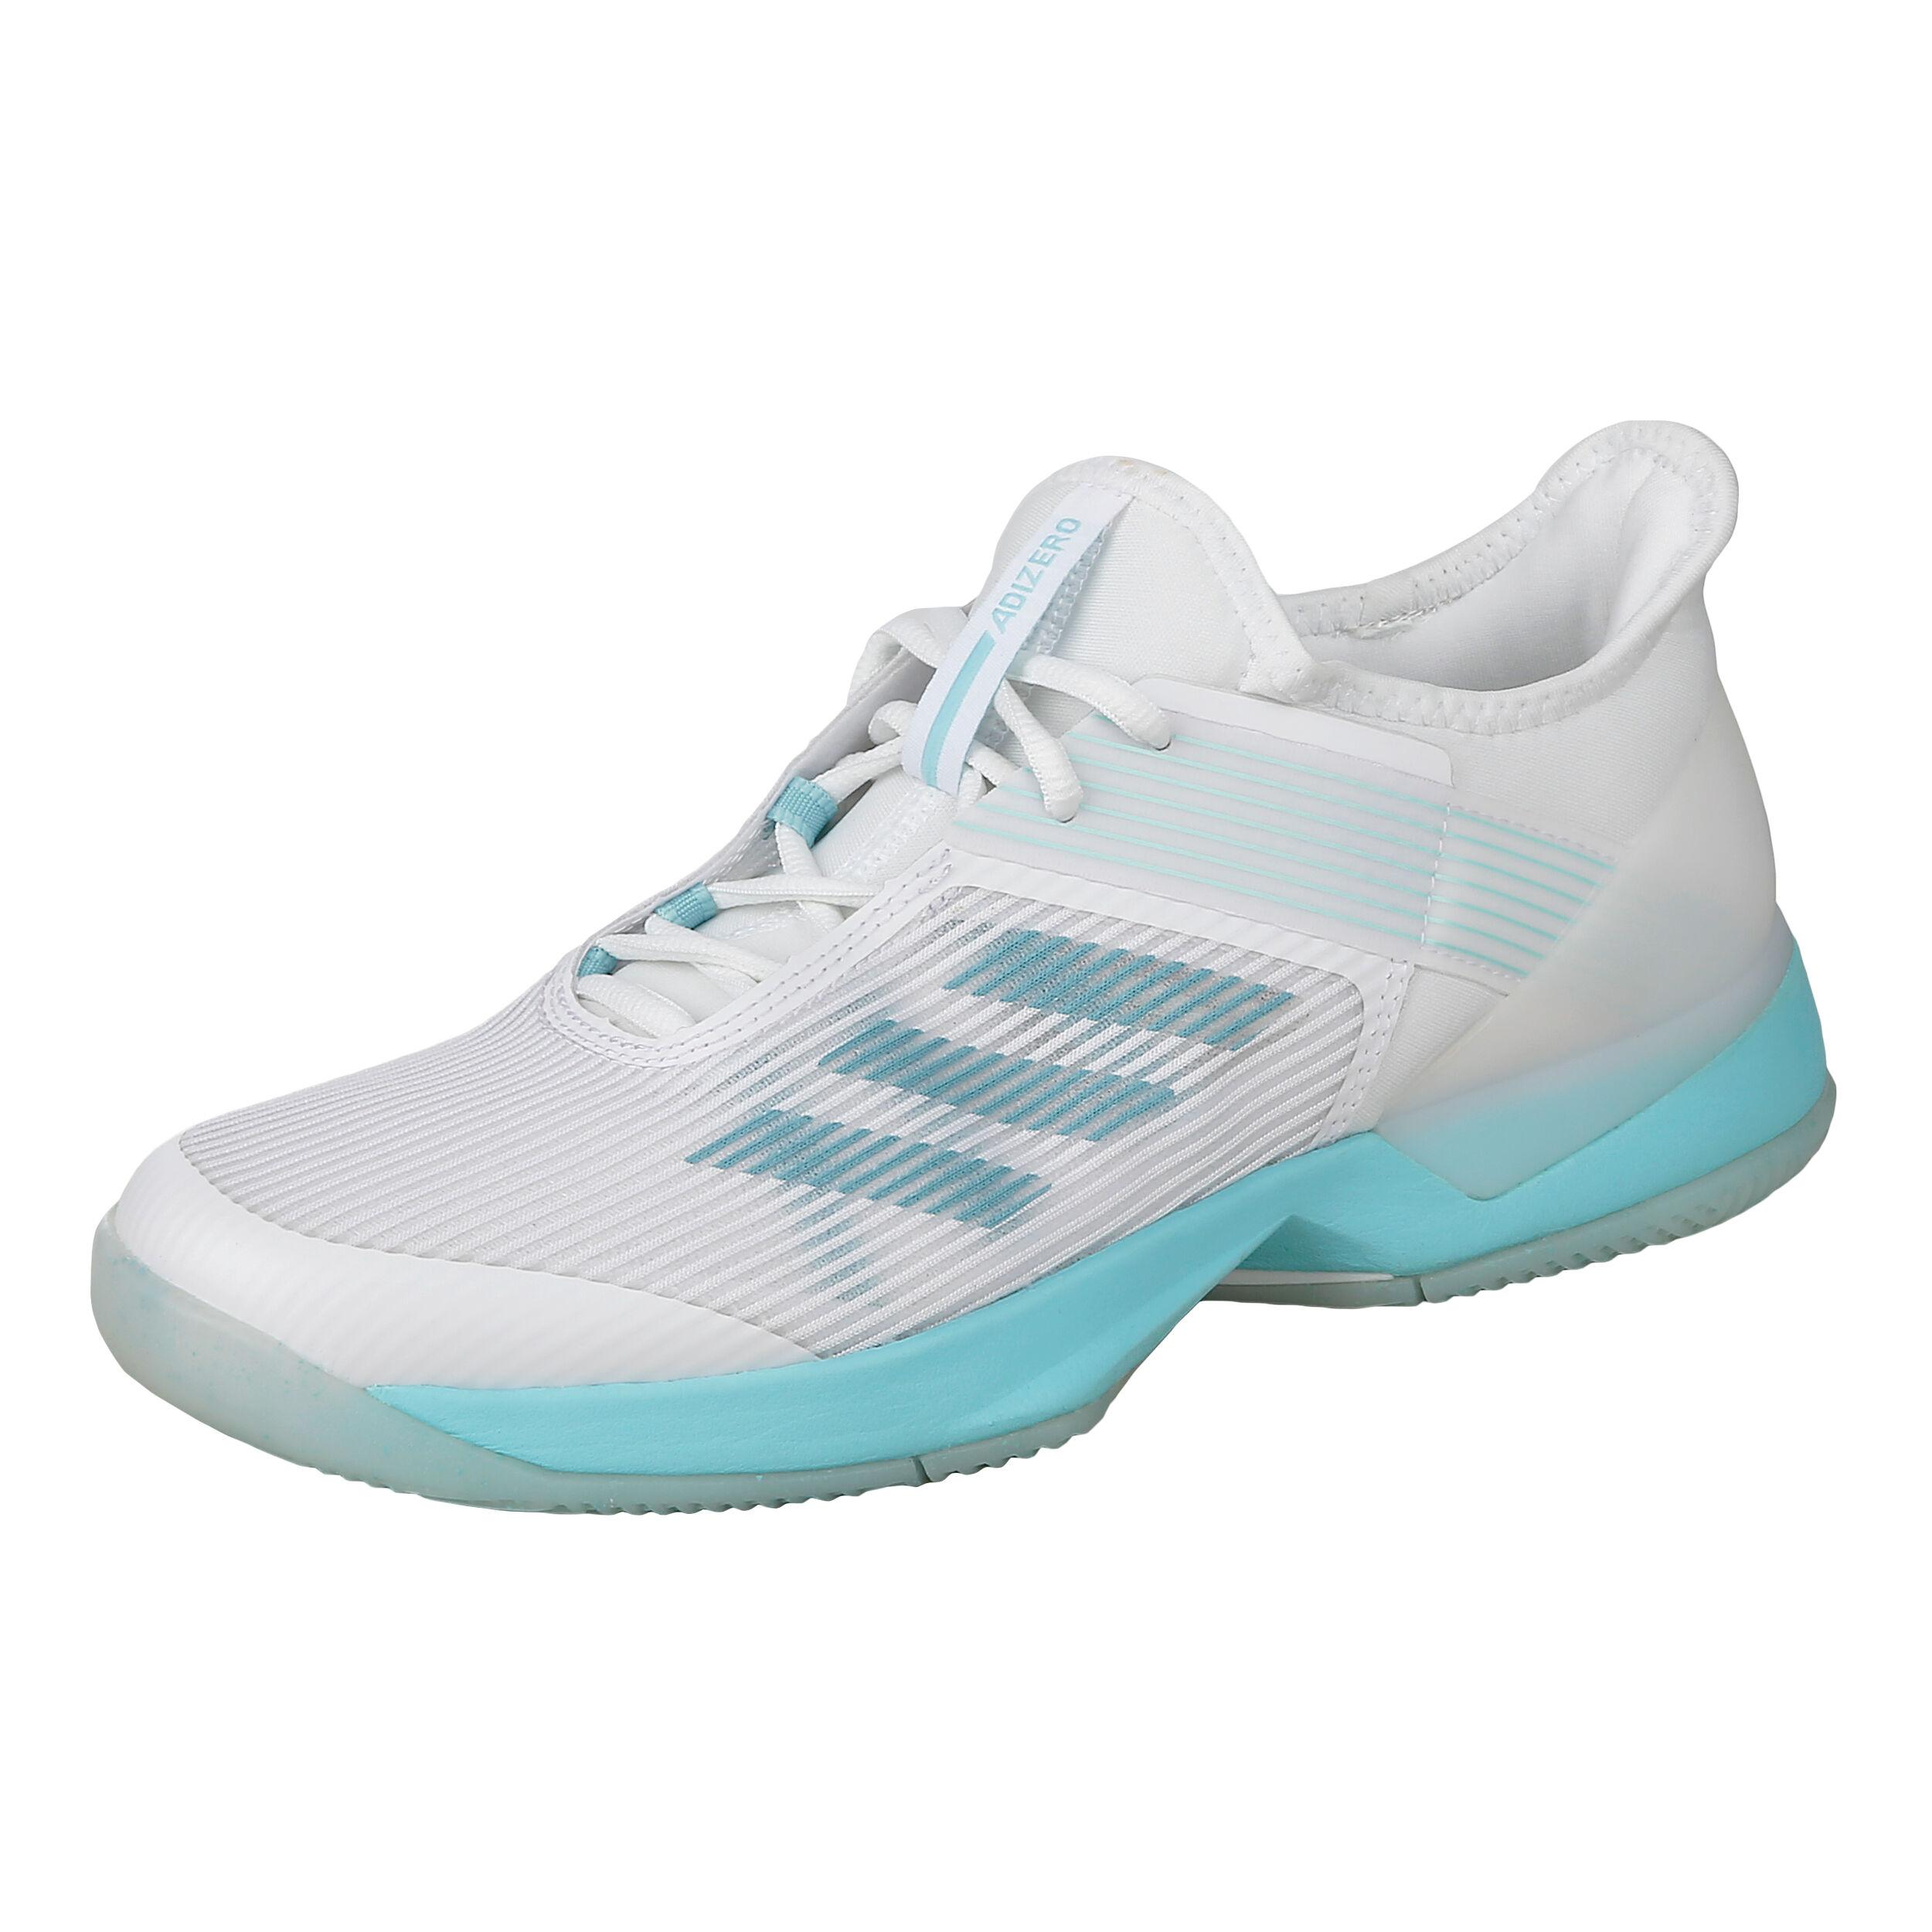 adidas Adizero Ubersonic 3 X Parley Chaussures Toutes